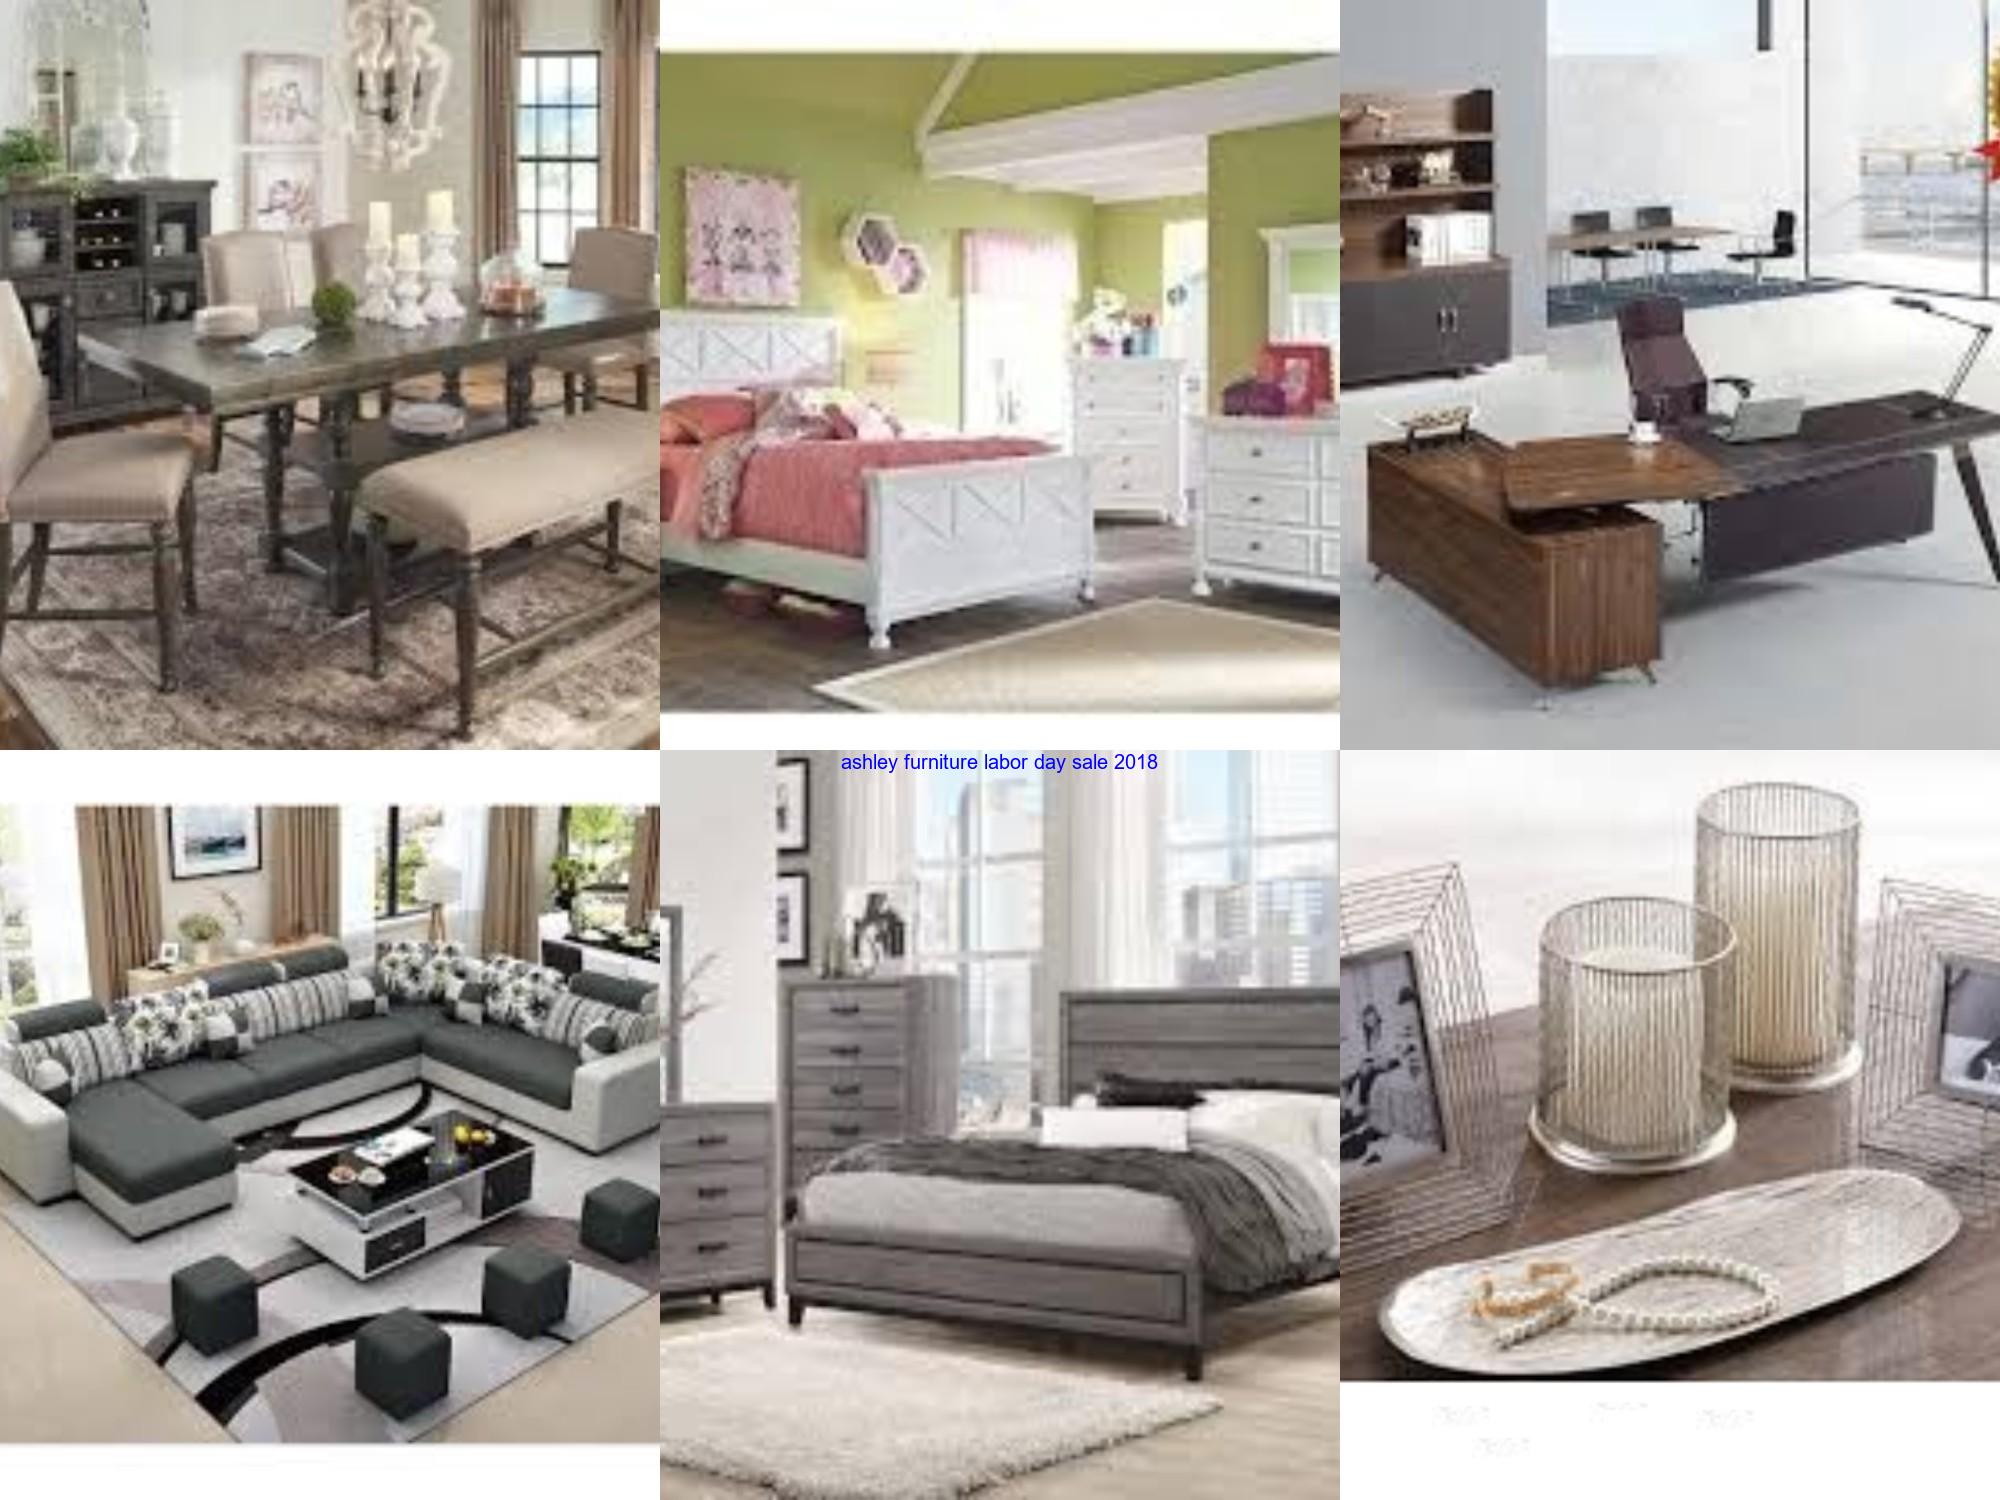 Ashley Furniture Labor Day Sale 2018 Furniture Prices Wholesale Furniture Furniture Catalog